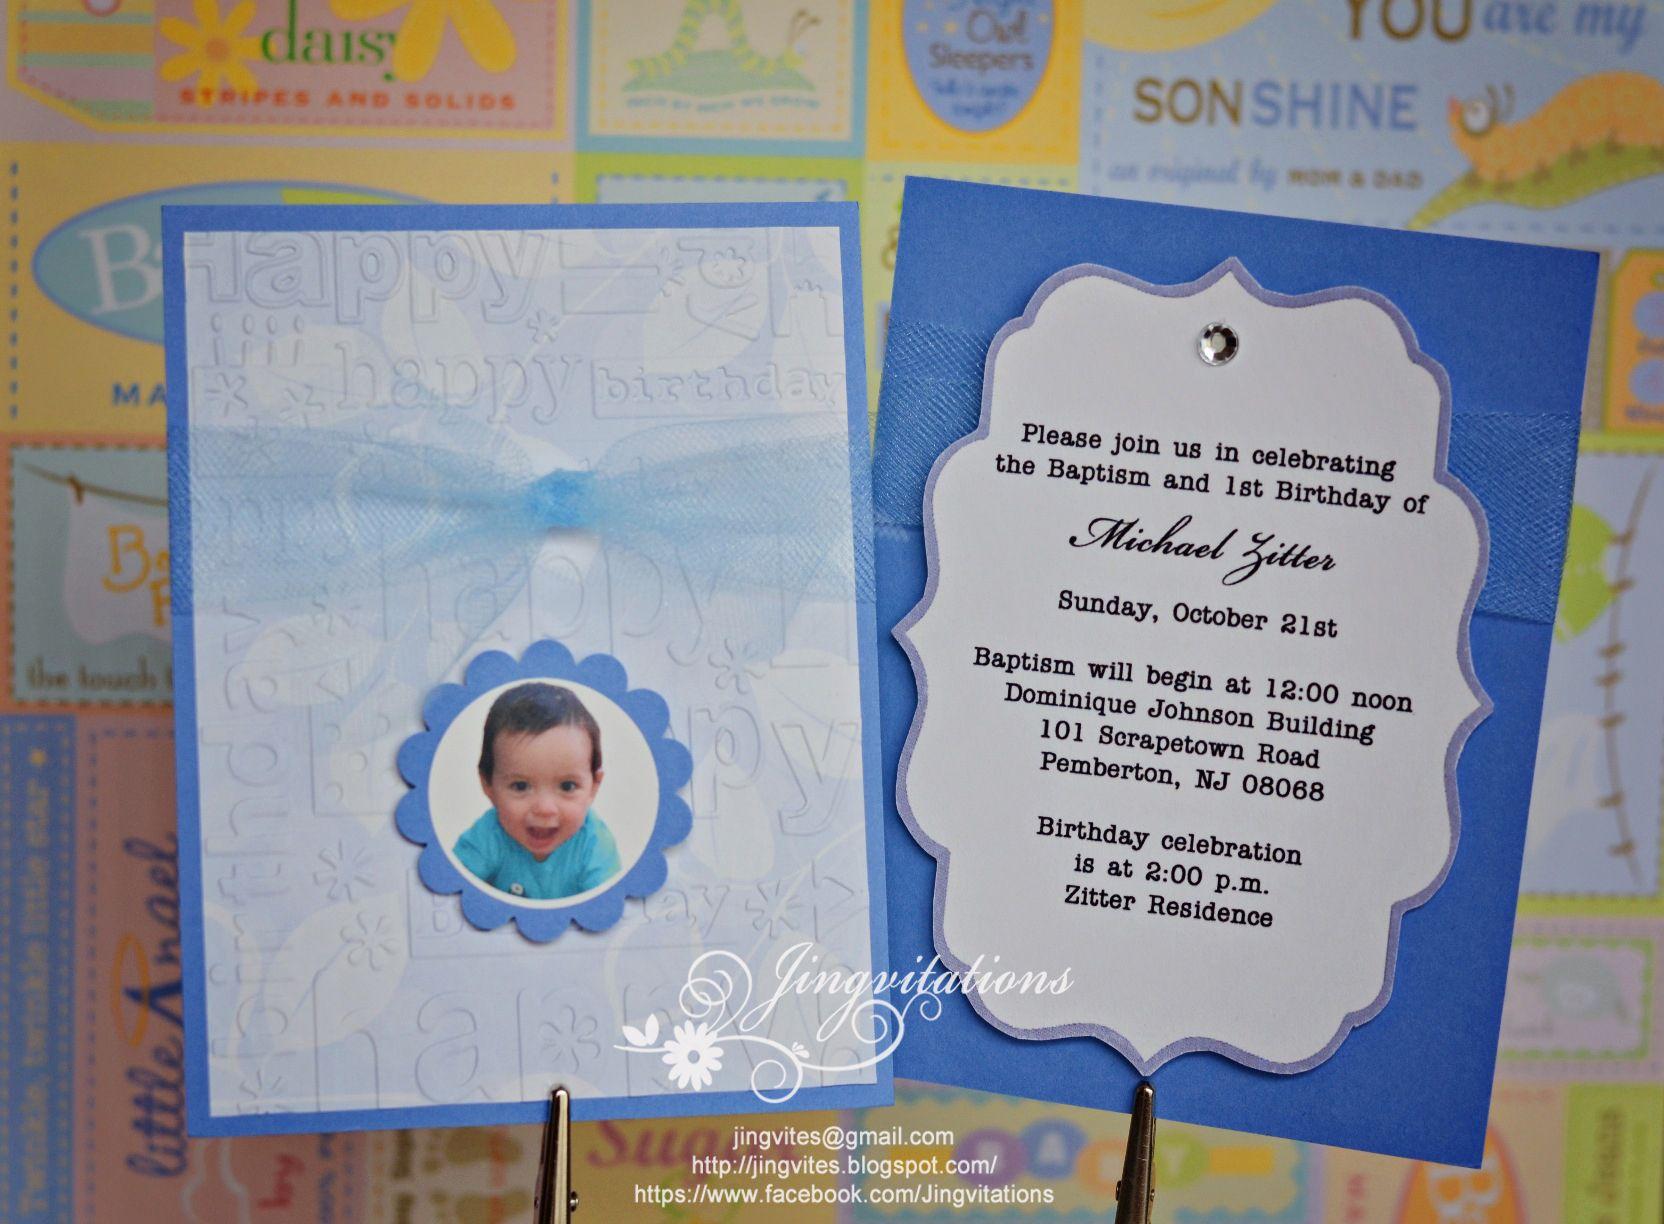 1st birthday and christeningbaptism invitation sample baptism 1st birthday and christeningbaptism invitation sample stopboris Images